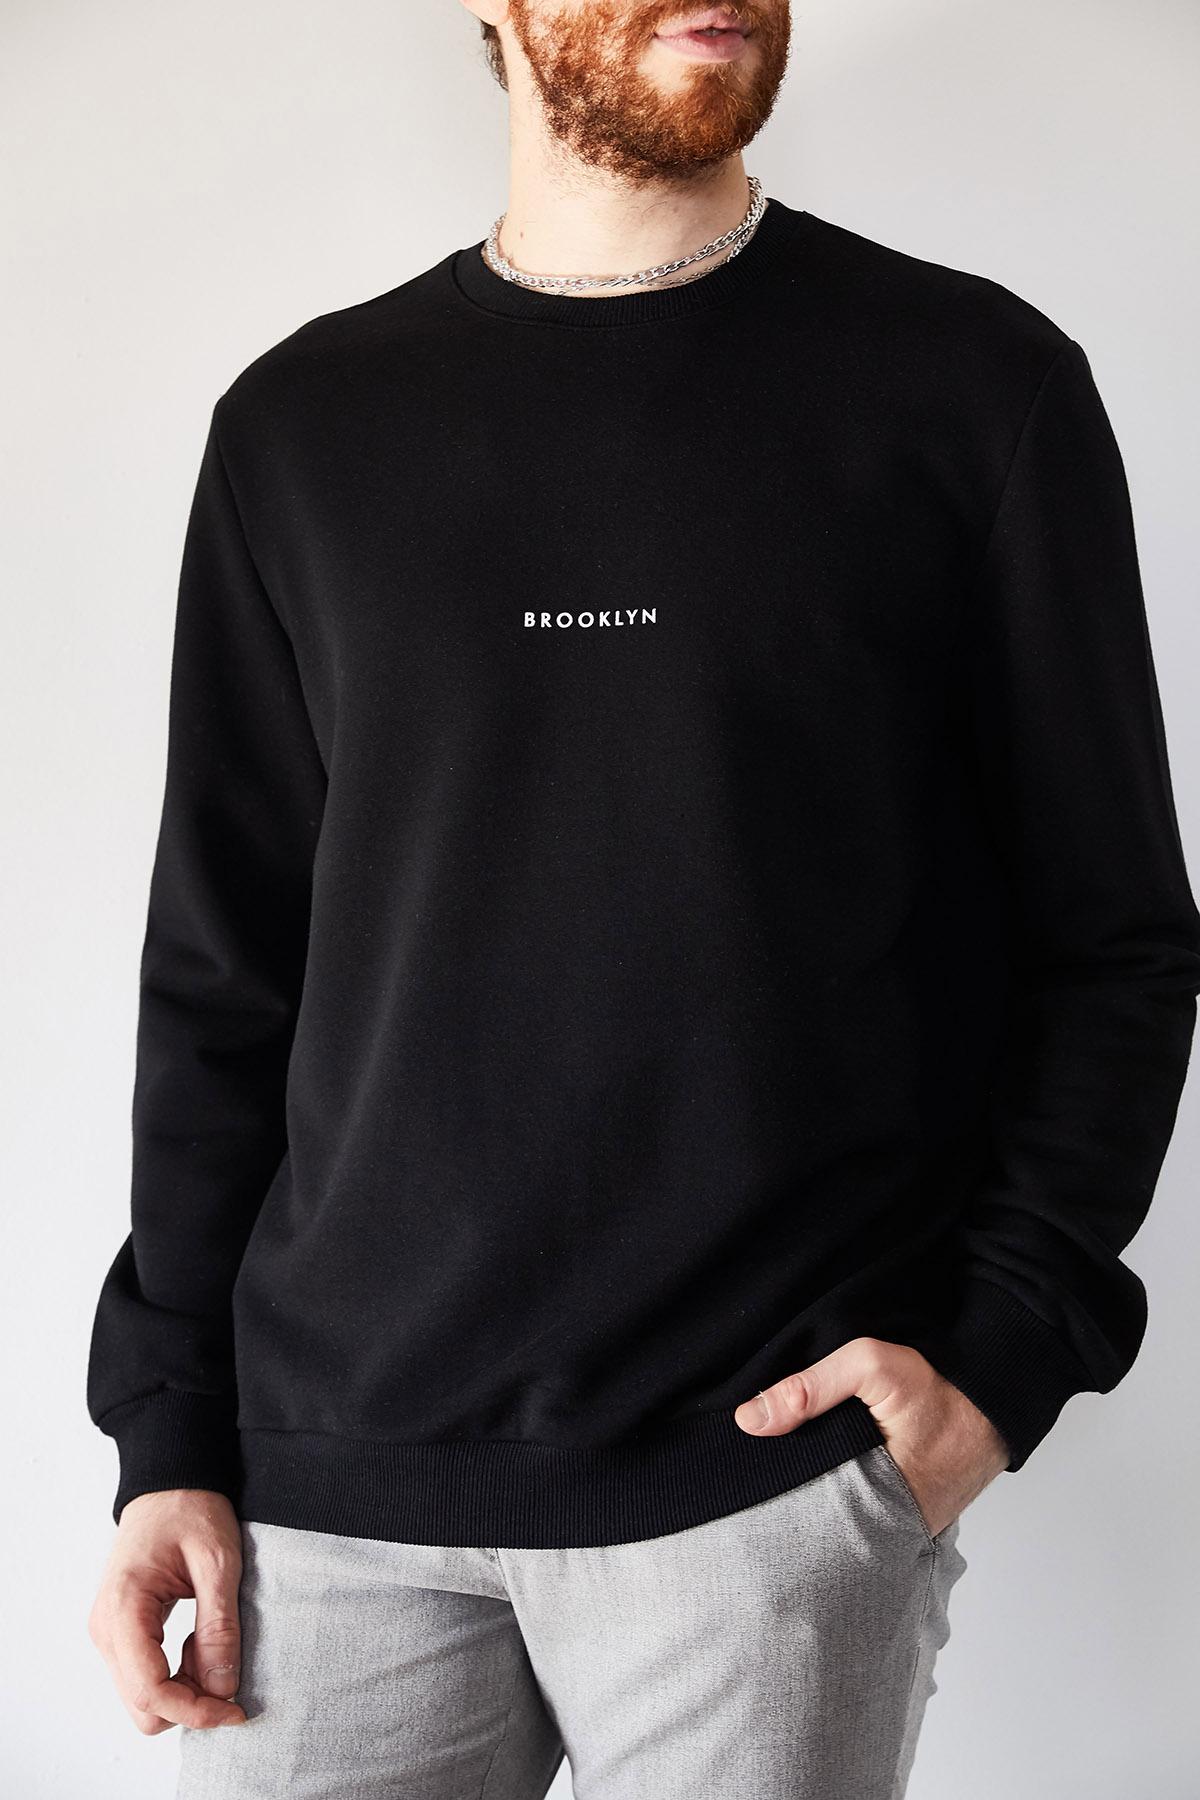 - Siyah Brooklyn Baskılı Sweatshirt 1KXE8-44229-02